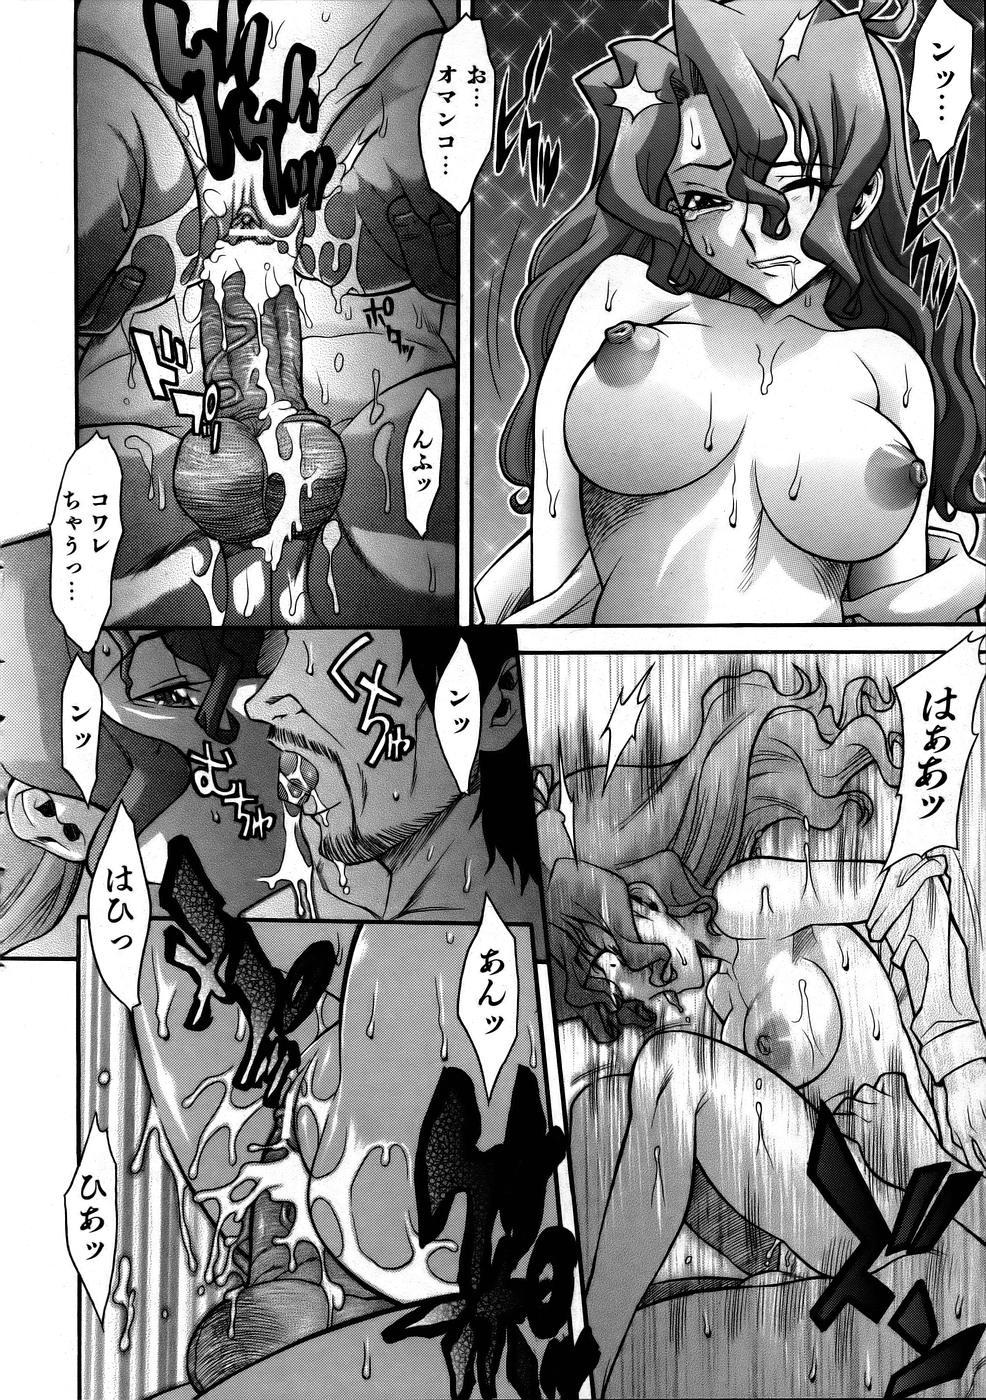 COMIC AUN 2005-10 Vol. 113 155